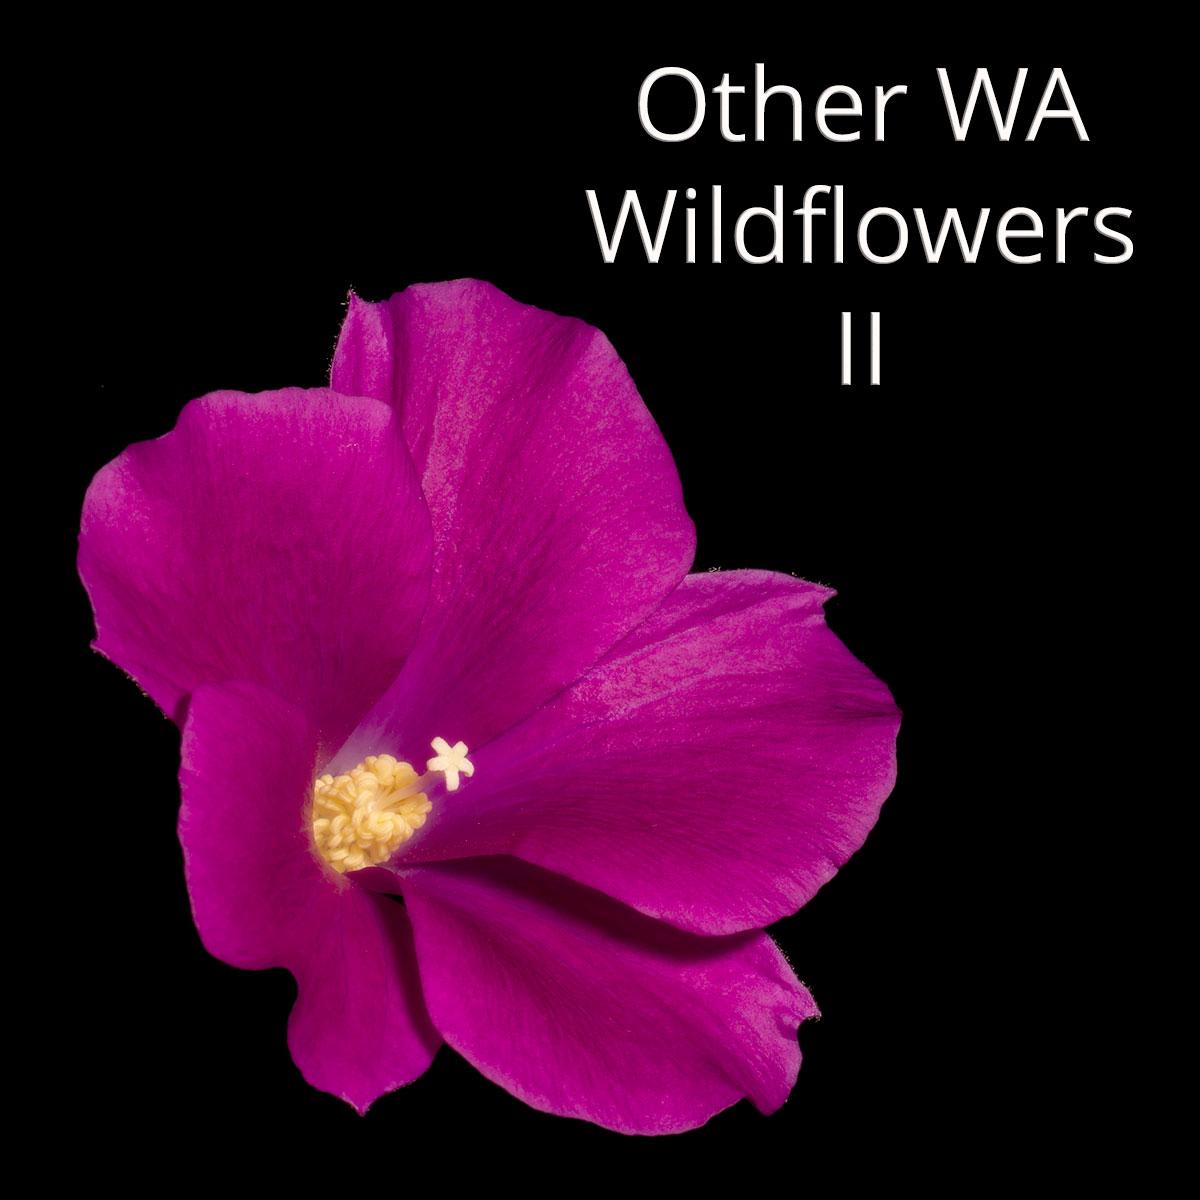 South west WA wildflower: lilac hibiscus (Alyogyne huegelii)